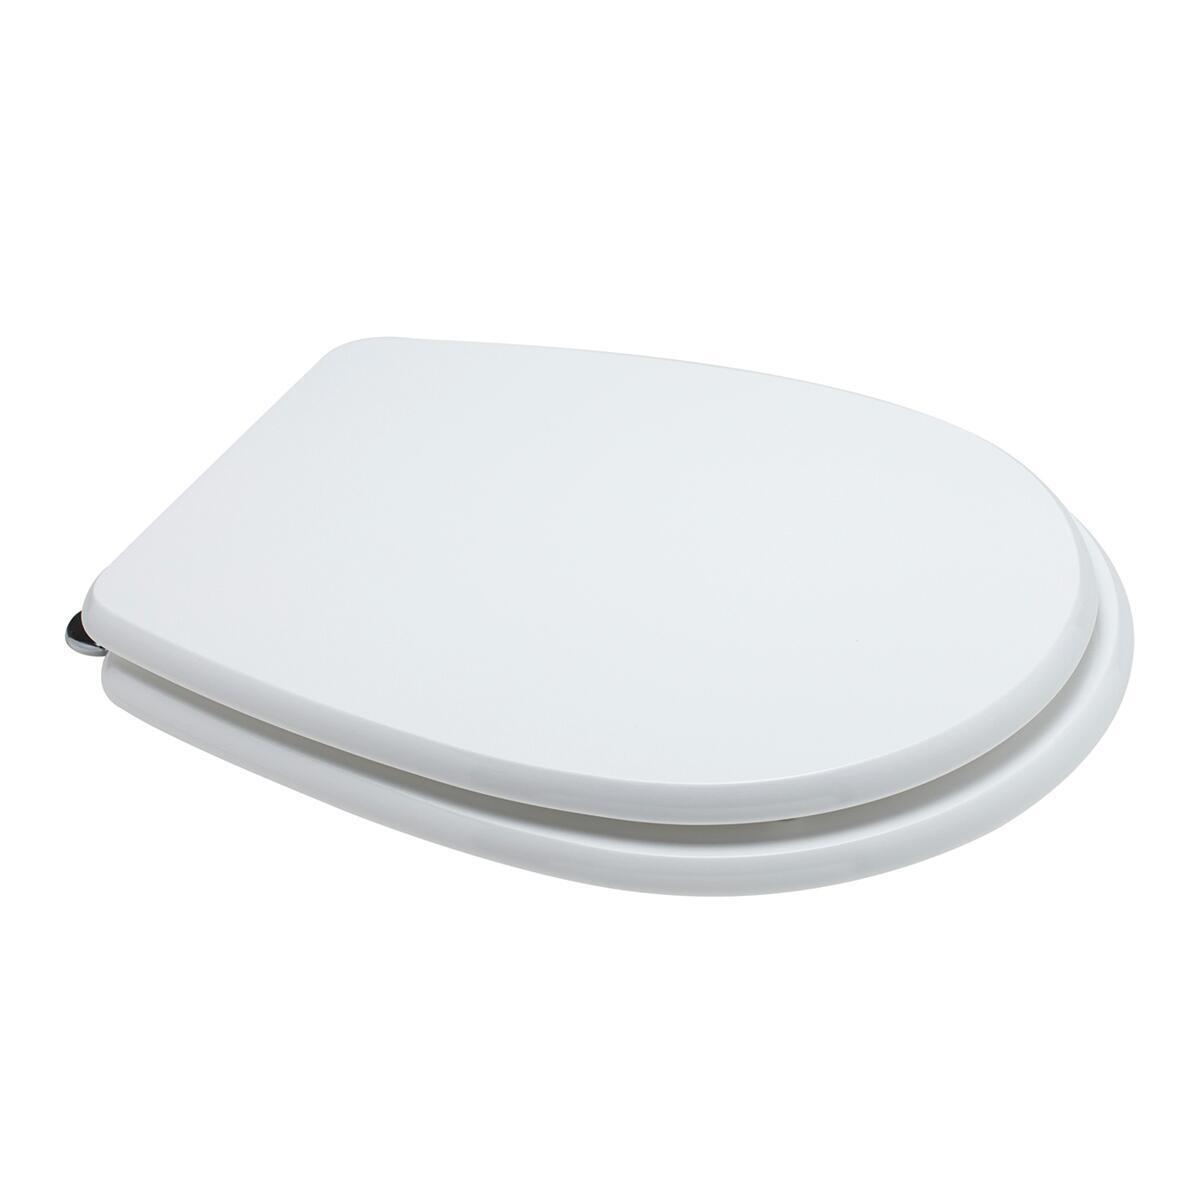 Copriwater ovale Universale Liuto mdf bianco - 4